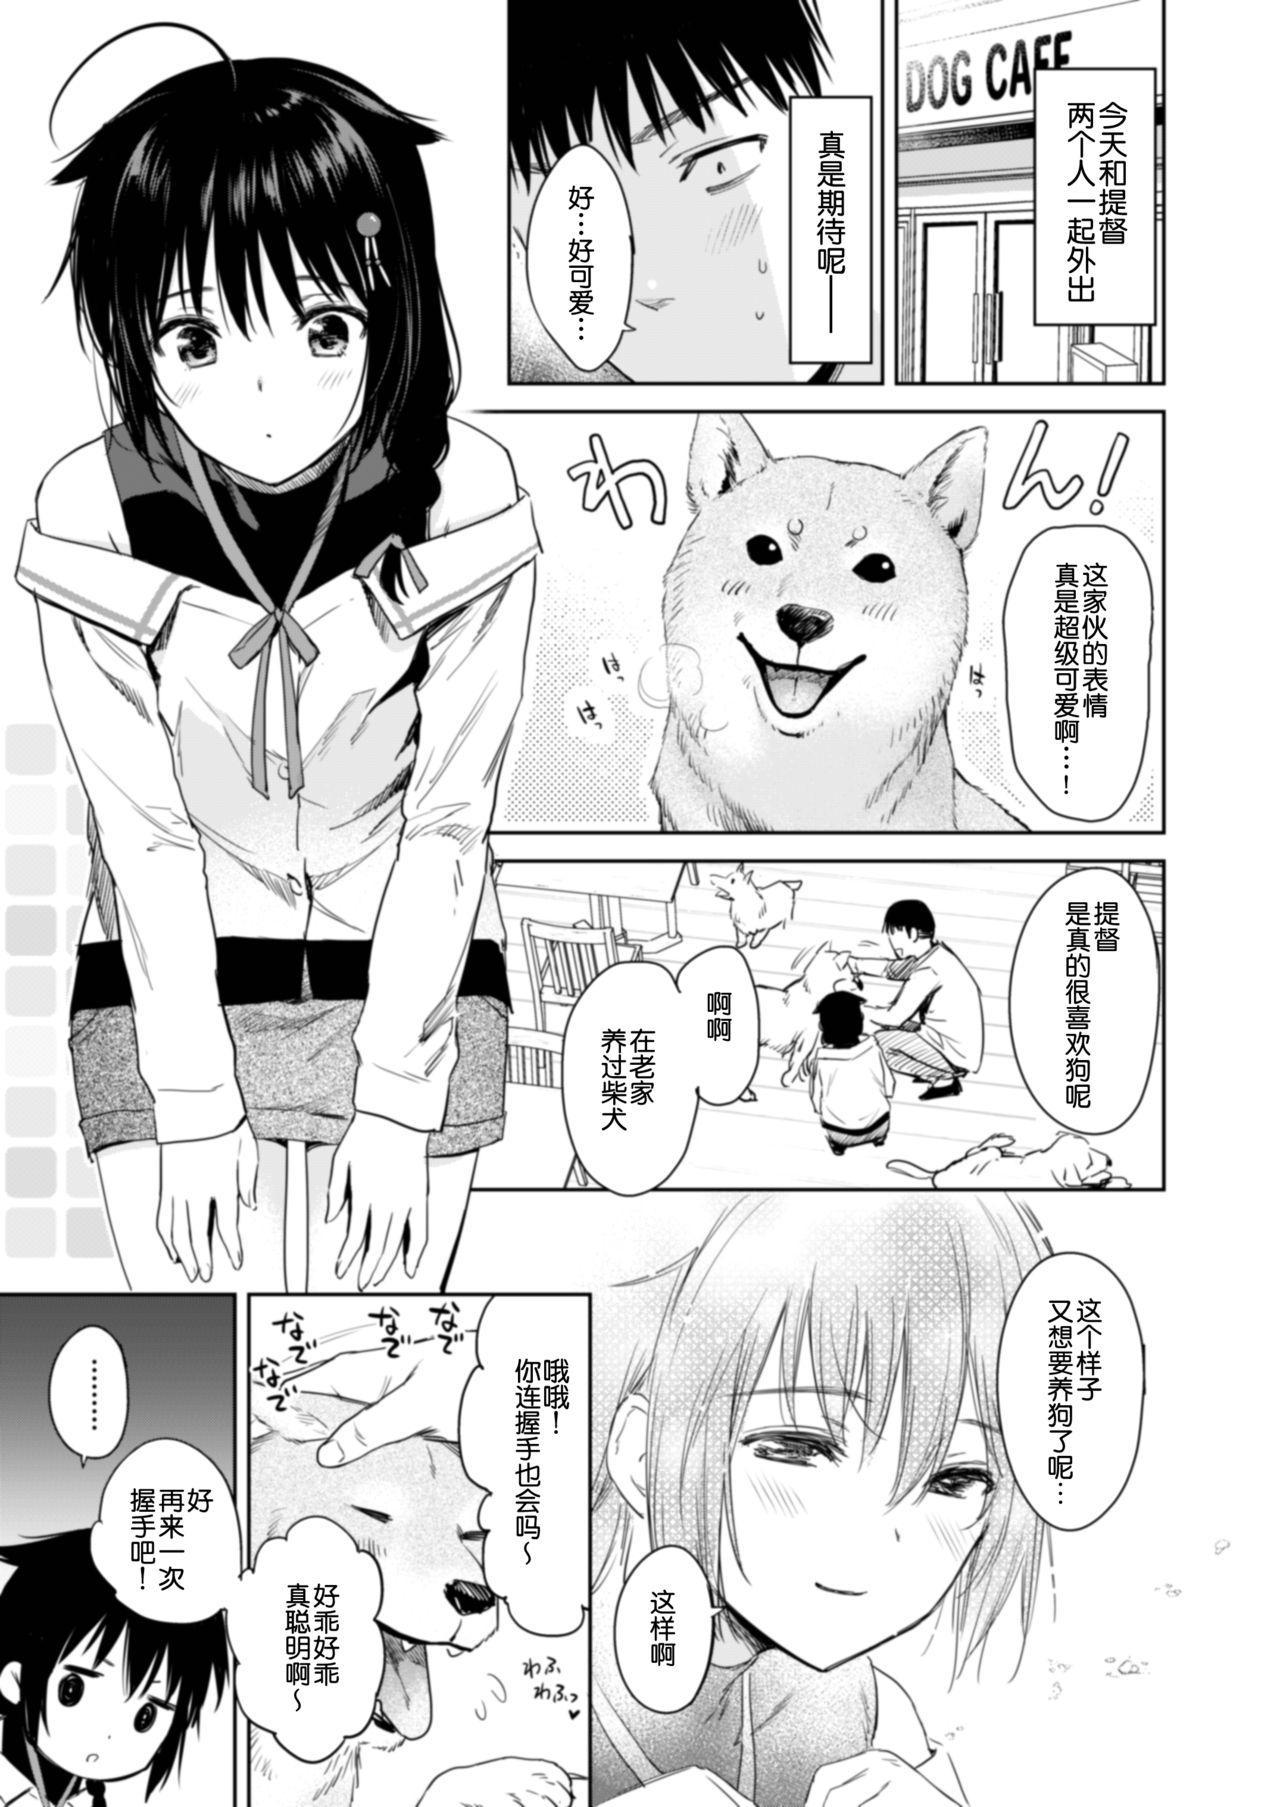 Shigure honey dog 3